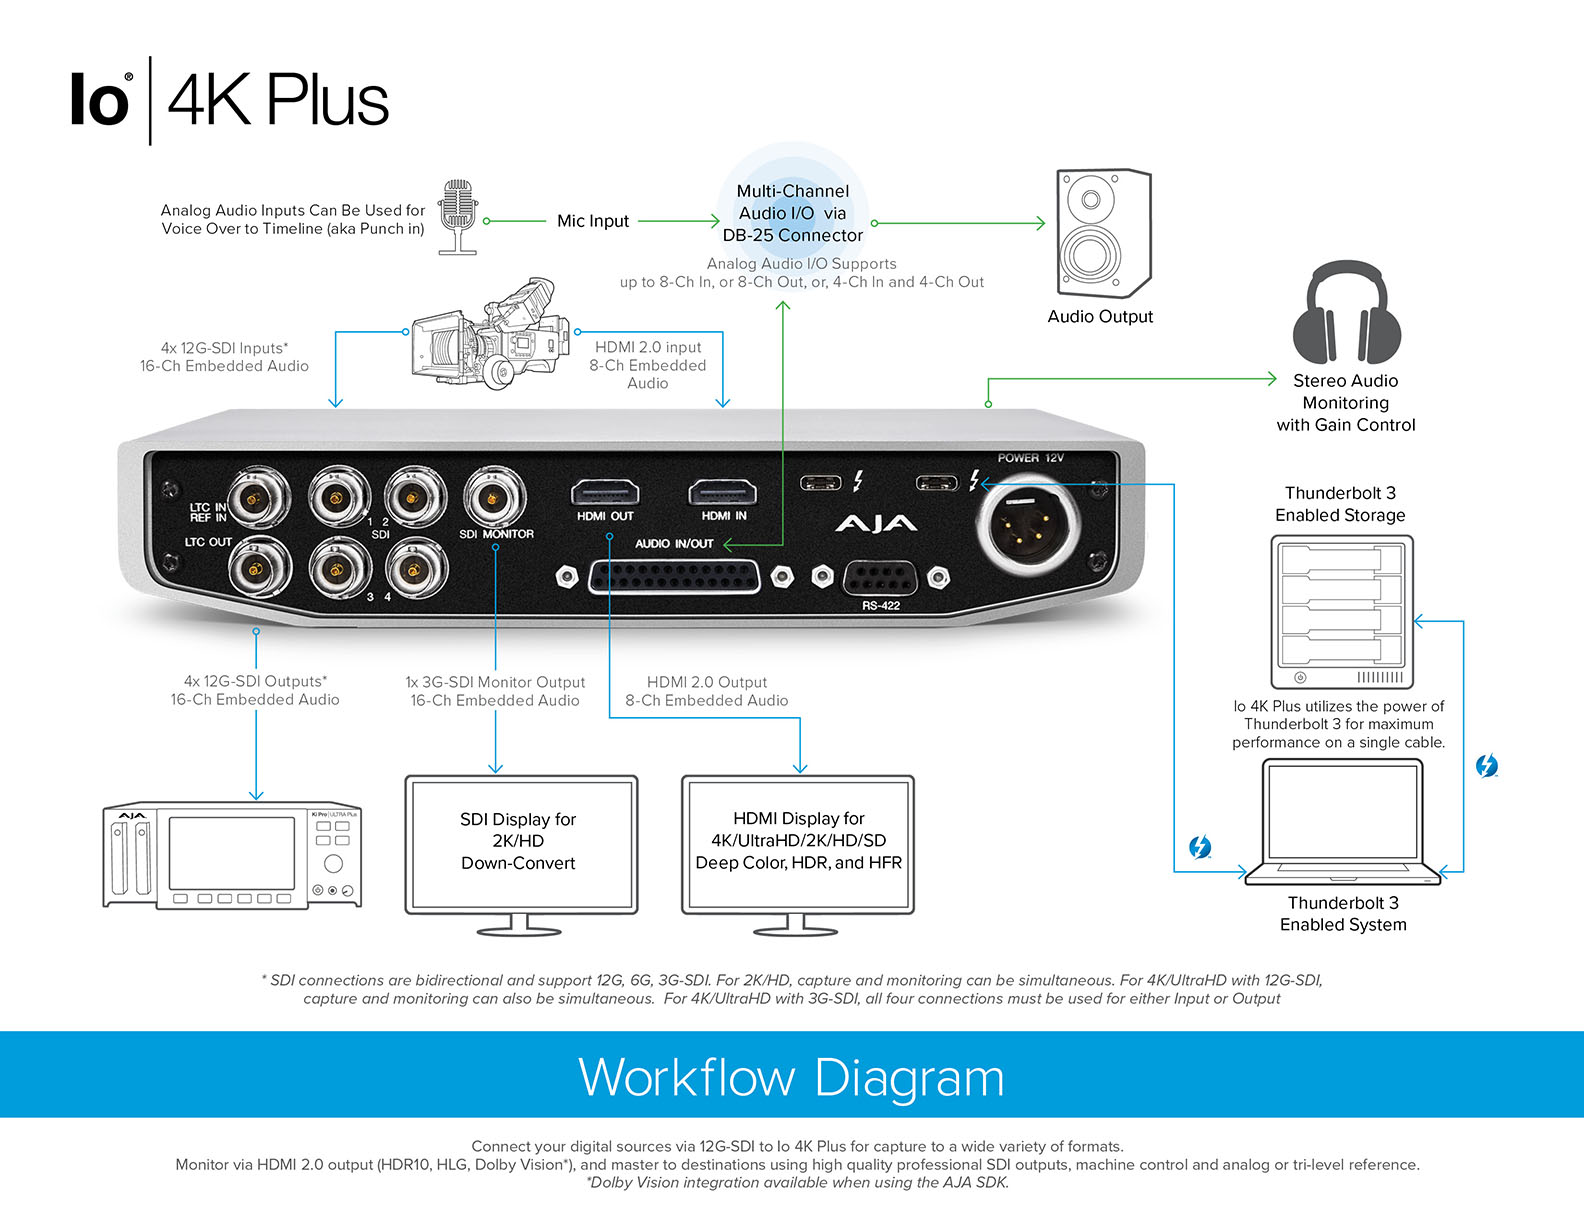 Io 4K Plus - Professional Video I/O with Thunderbolt™ 3